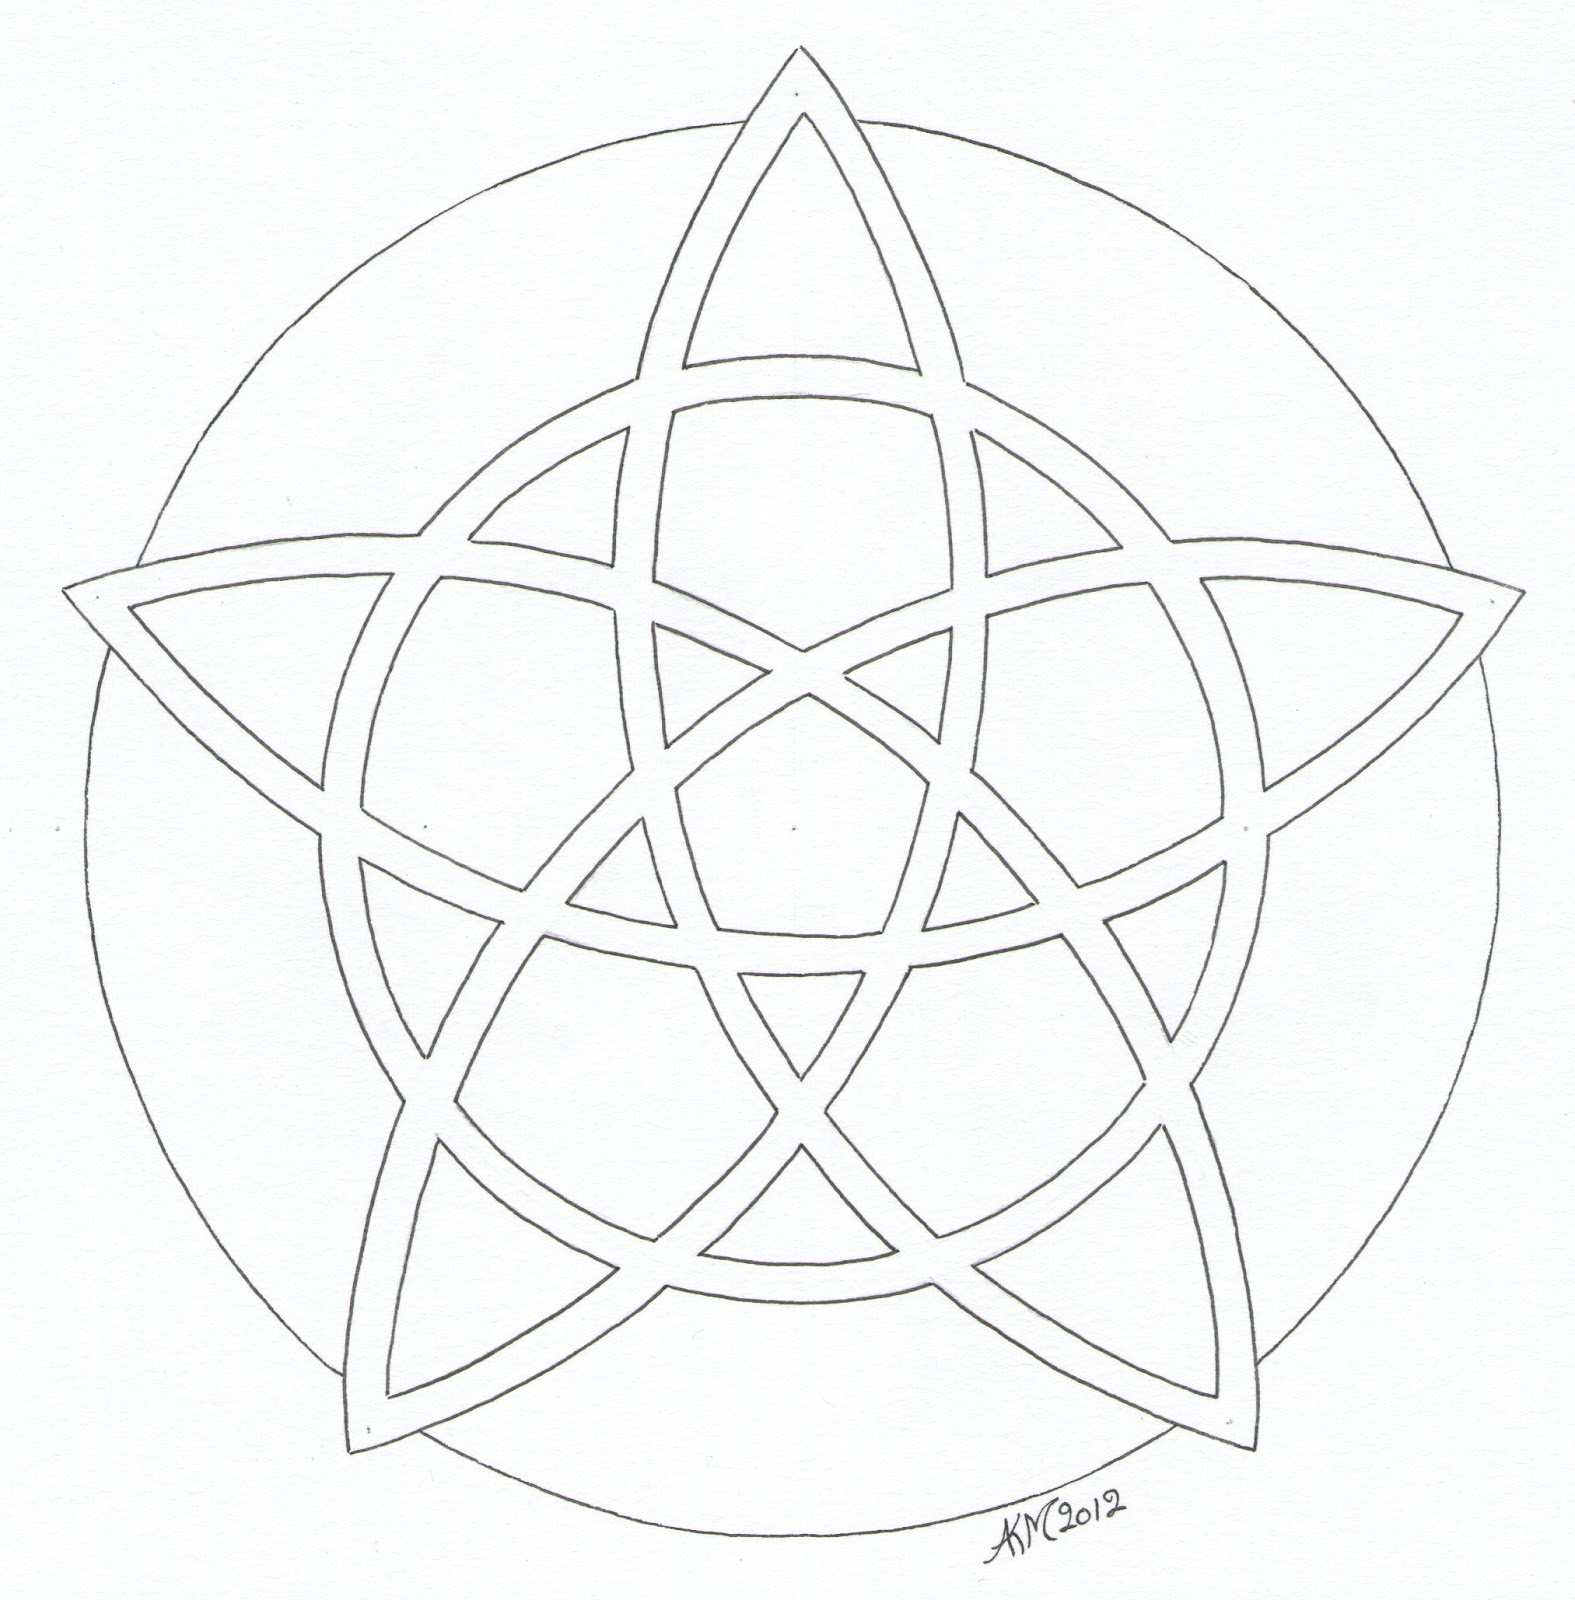 Mandala Kleurplaten Rozen.Mandala Kleurplaten Rozen Krijg Duizenden Kleurenfoto S Van De Beste